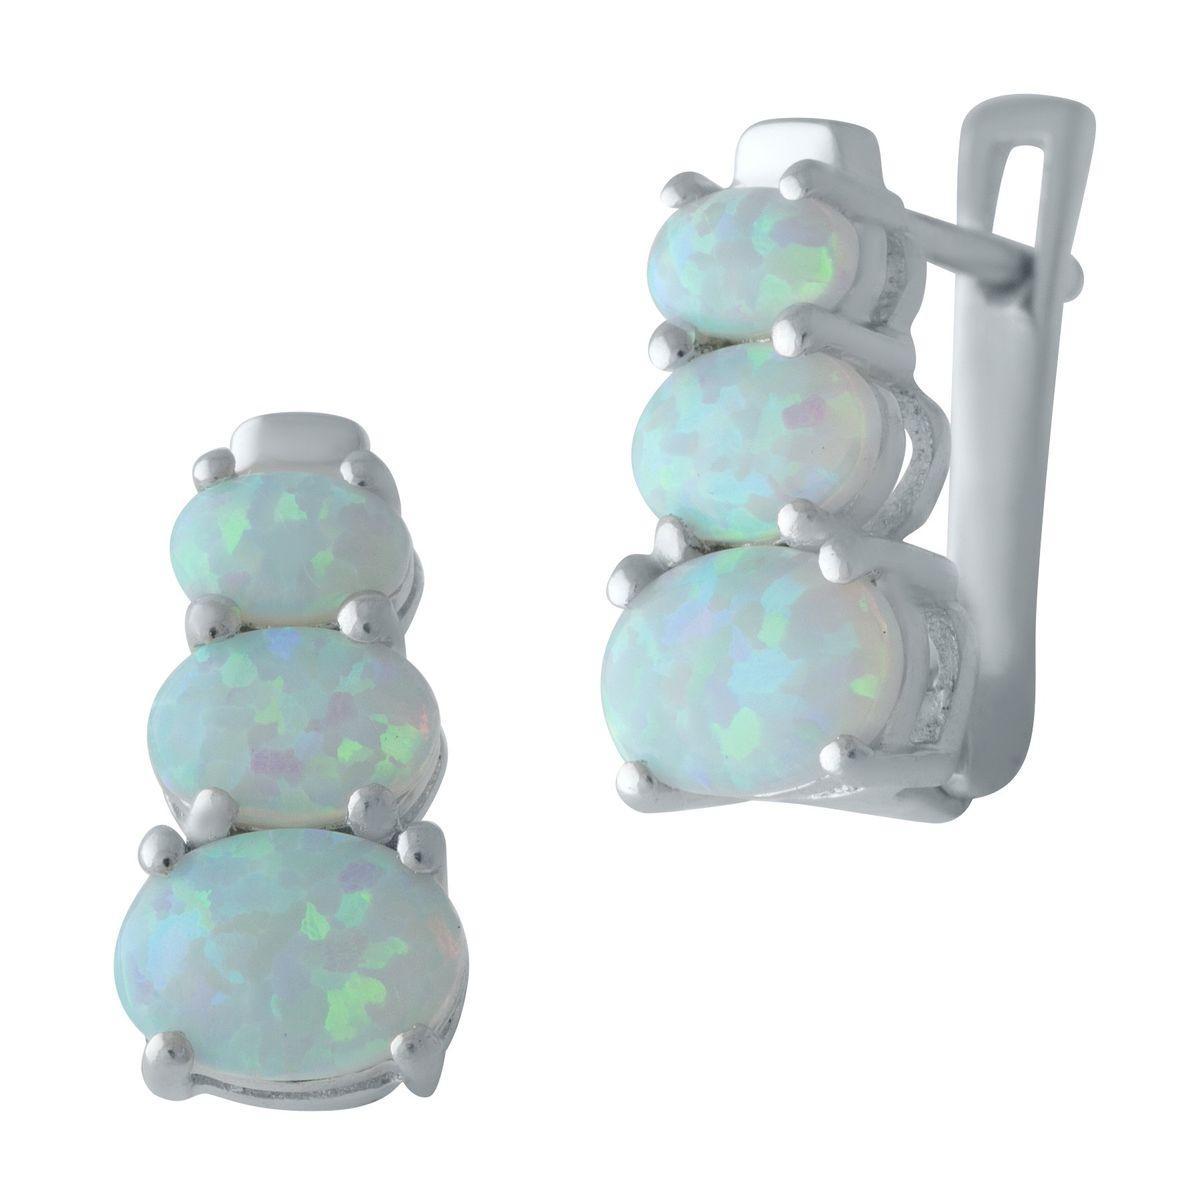 Серебряные серьги DreamJewelry с опалом (2009405)